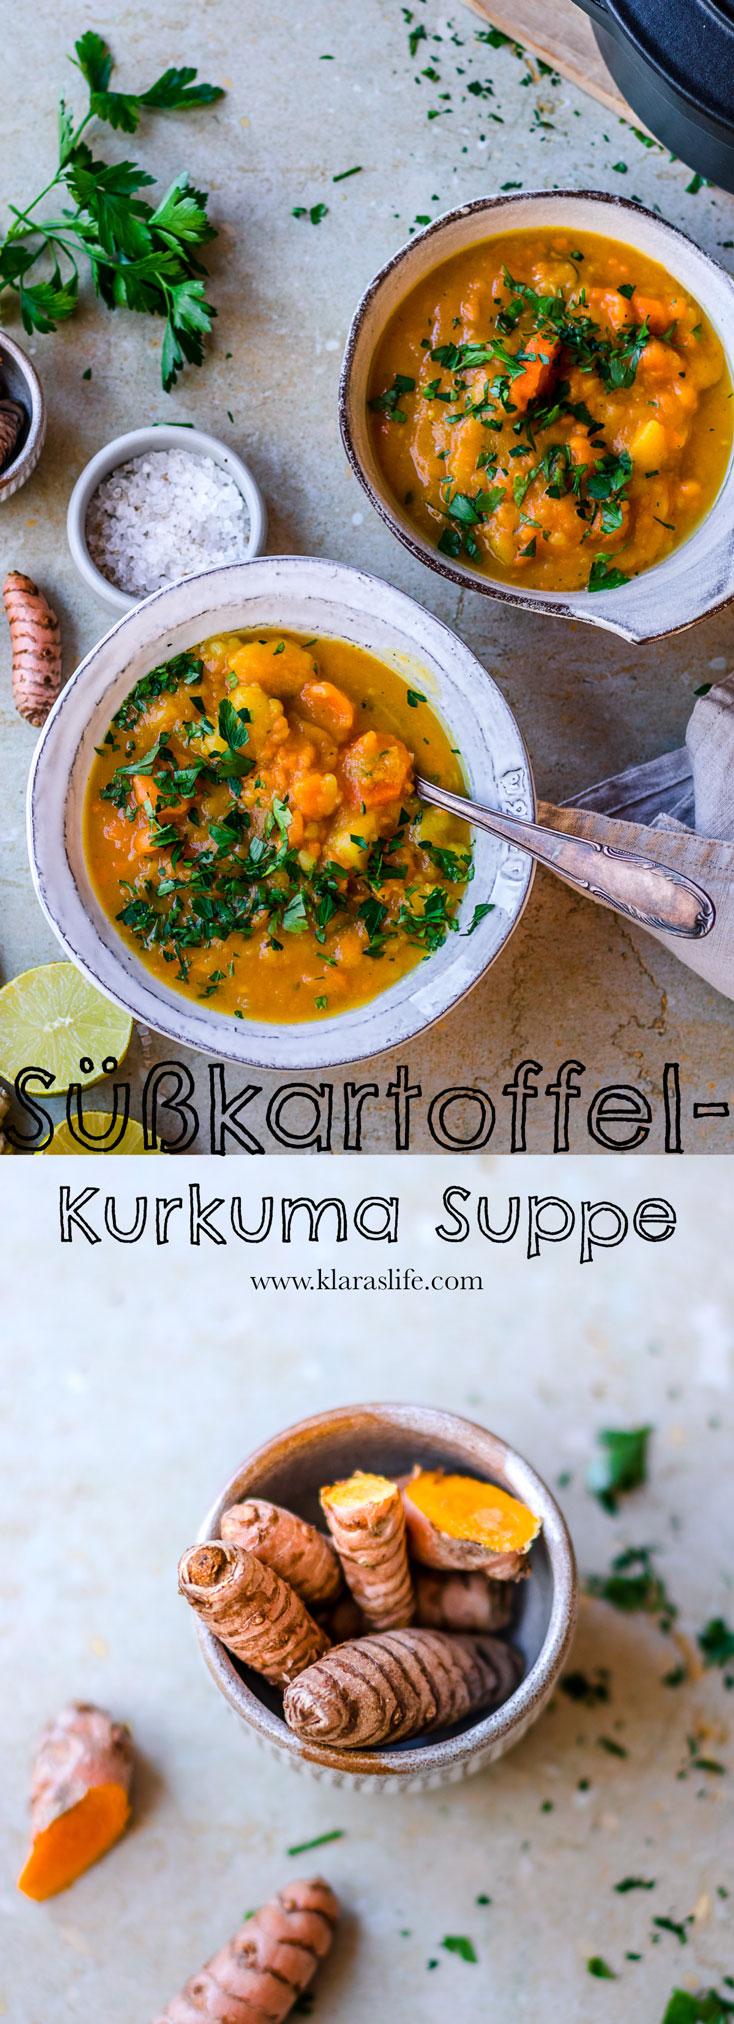 Süßkartoffel Kurkuma Suppe